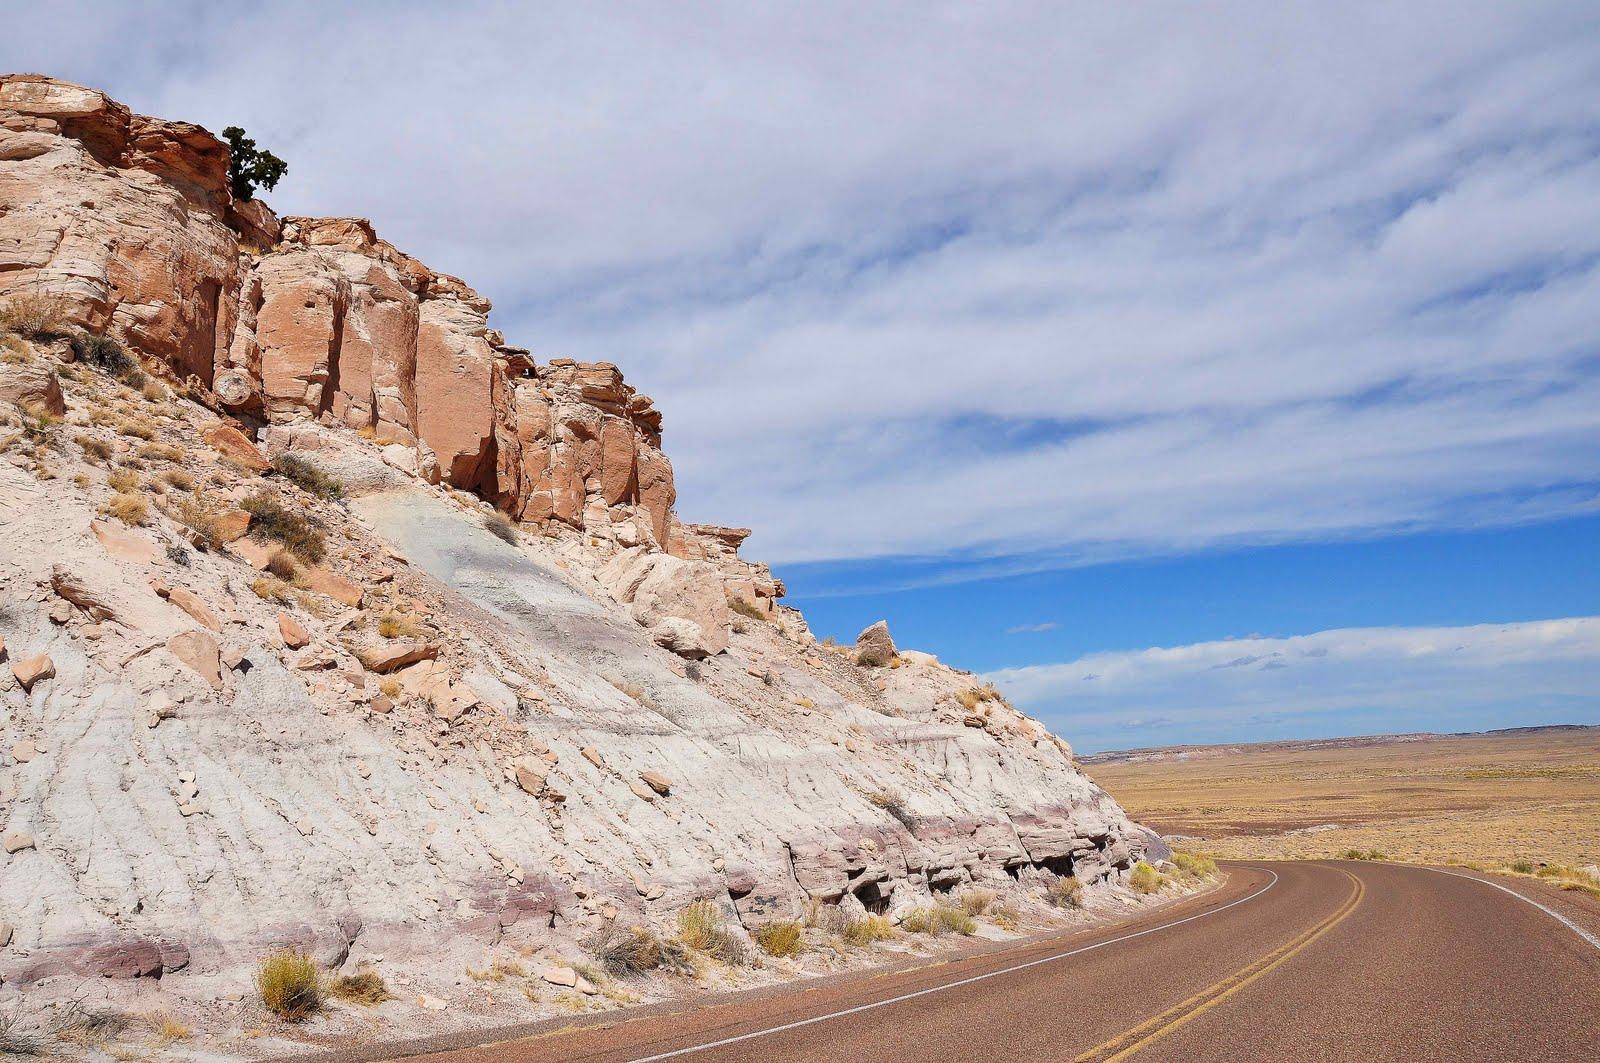 Nikon Sniper: Around The Bend In Arizona